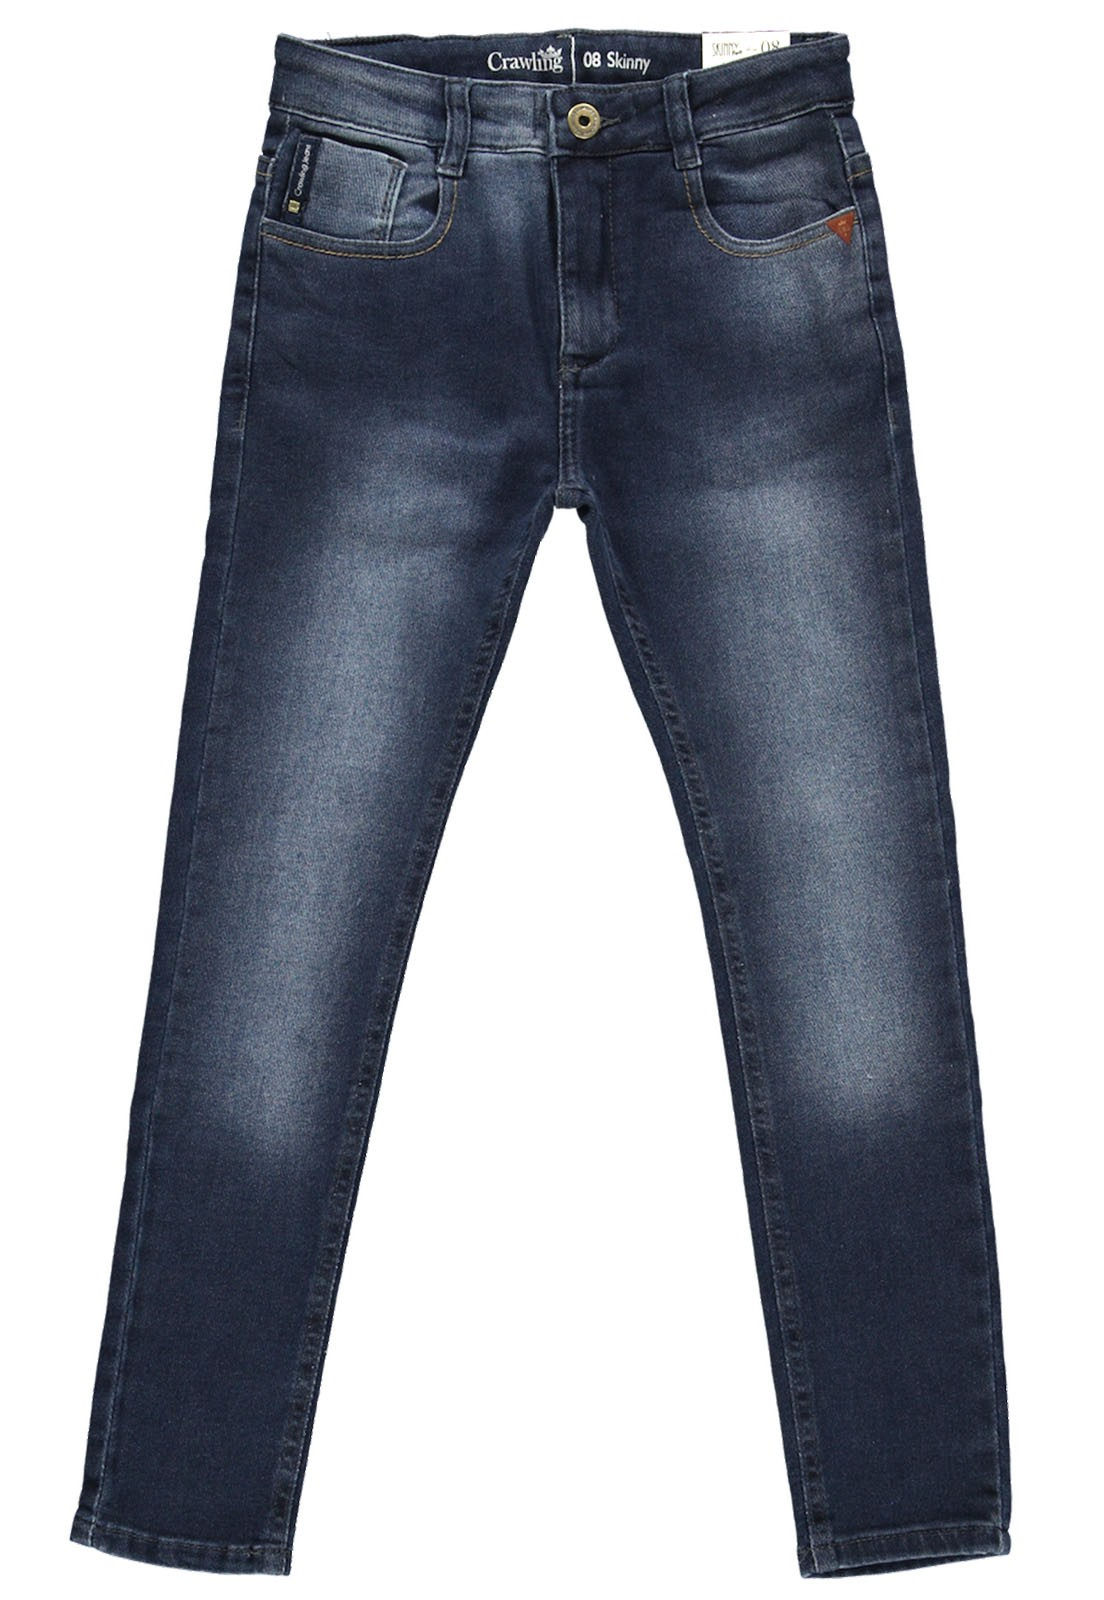 Calça Jeans Moletom Crawling Masculina Skinny